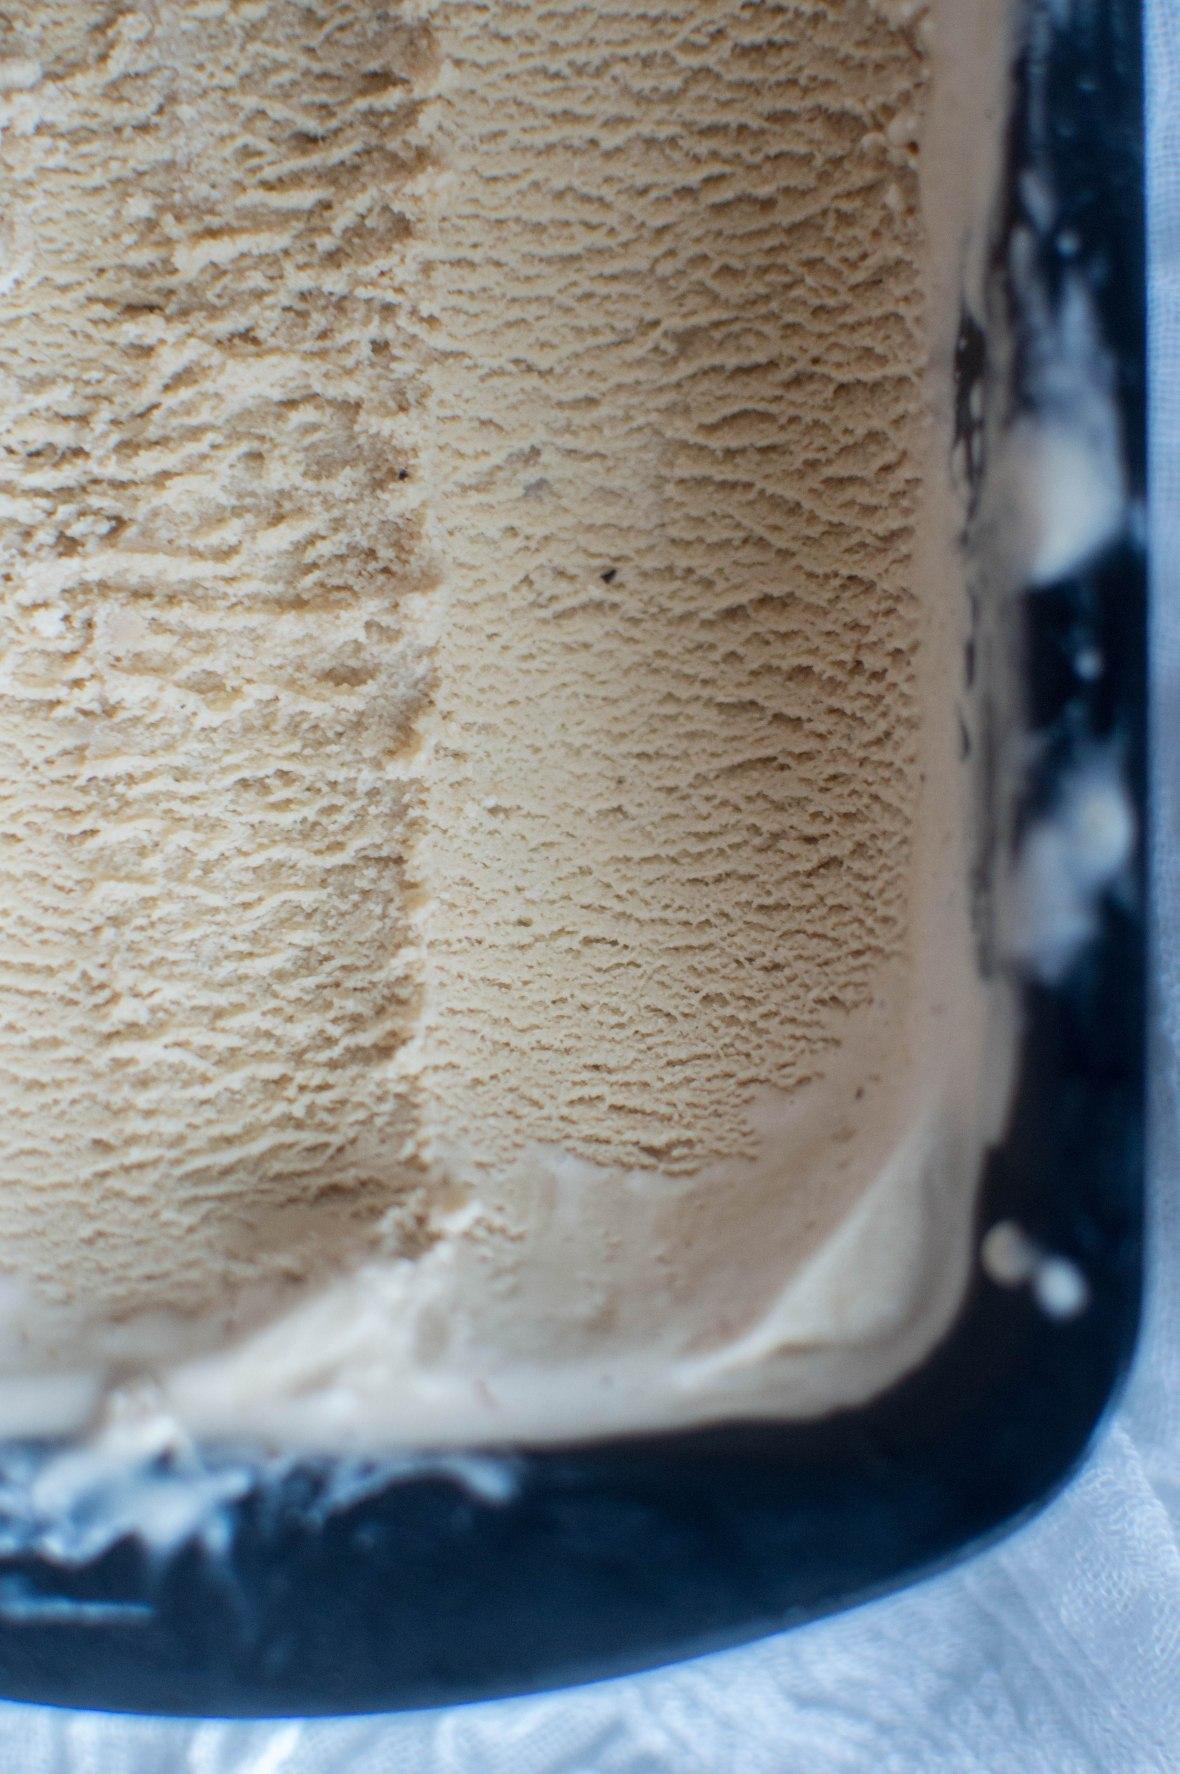 Coffee, Hazelnut & Tonka Bean Ice Cream Close Up - Kay's Kitchen